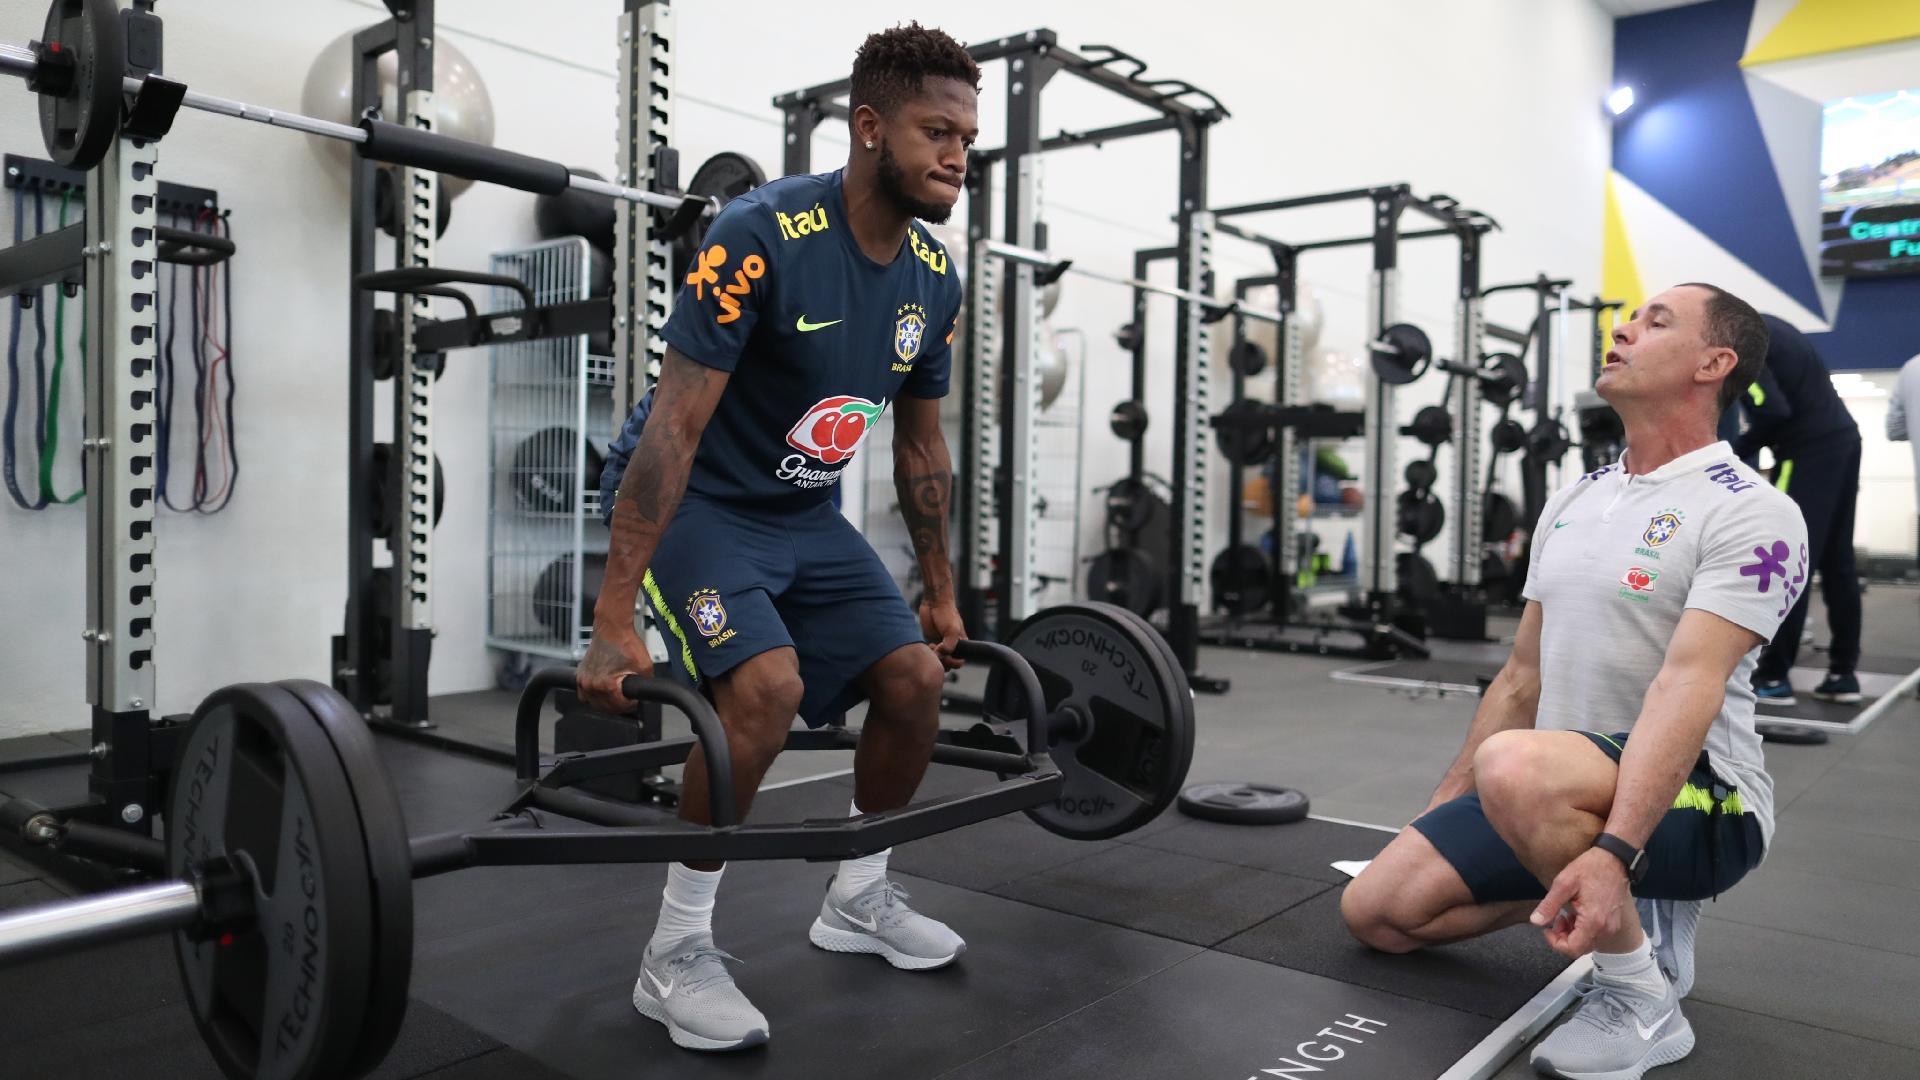 Fred participa de treino físico na academia da Granja Comary